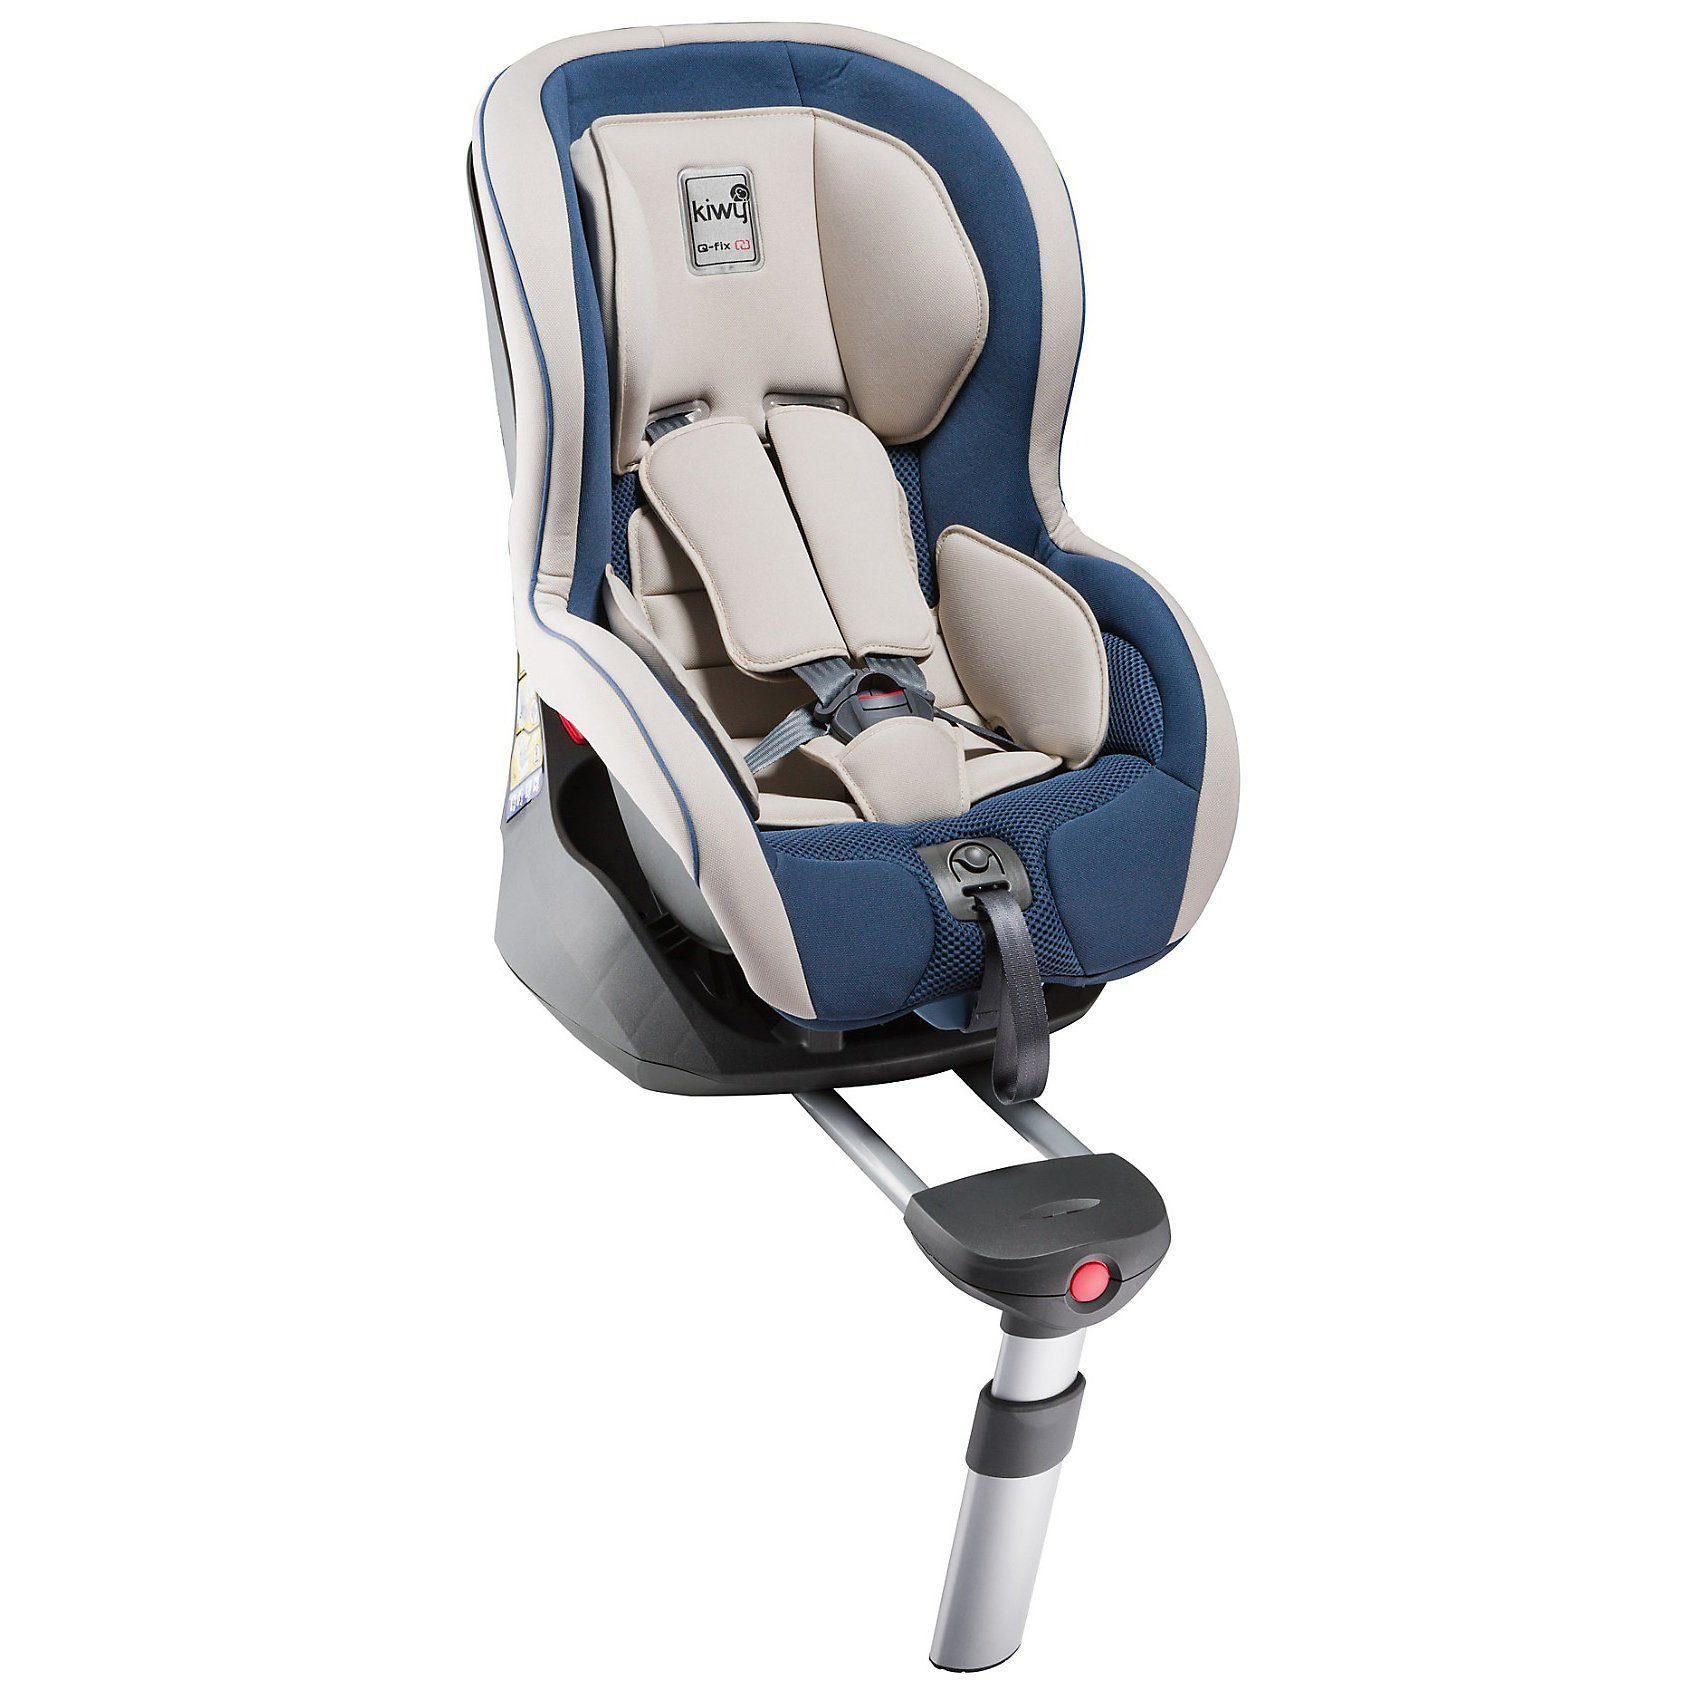 Kiwy Auto-Kindersitz SPF1 SA-ATS, Isofix, Ocean, 2016